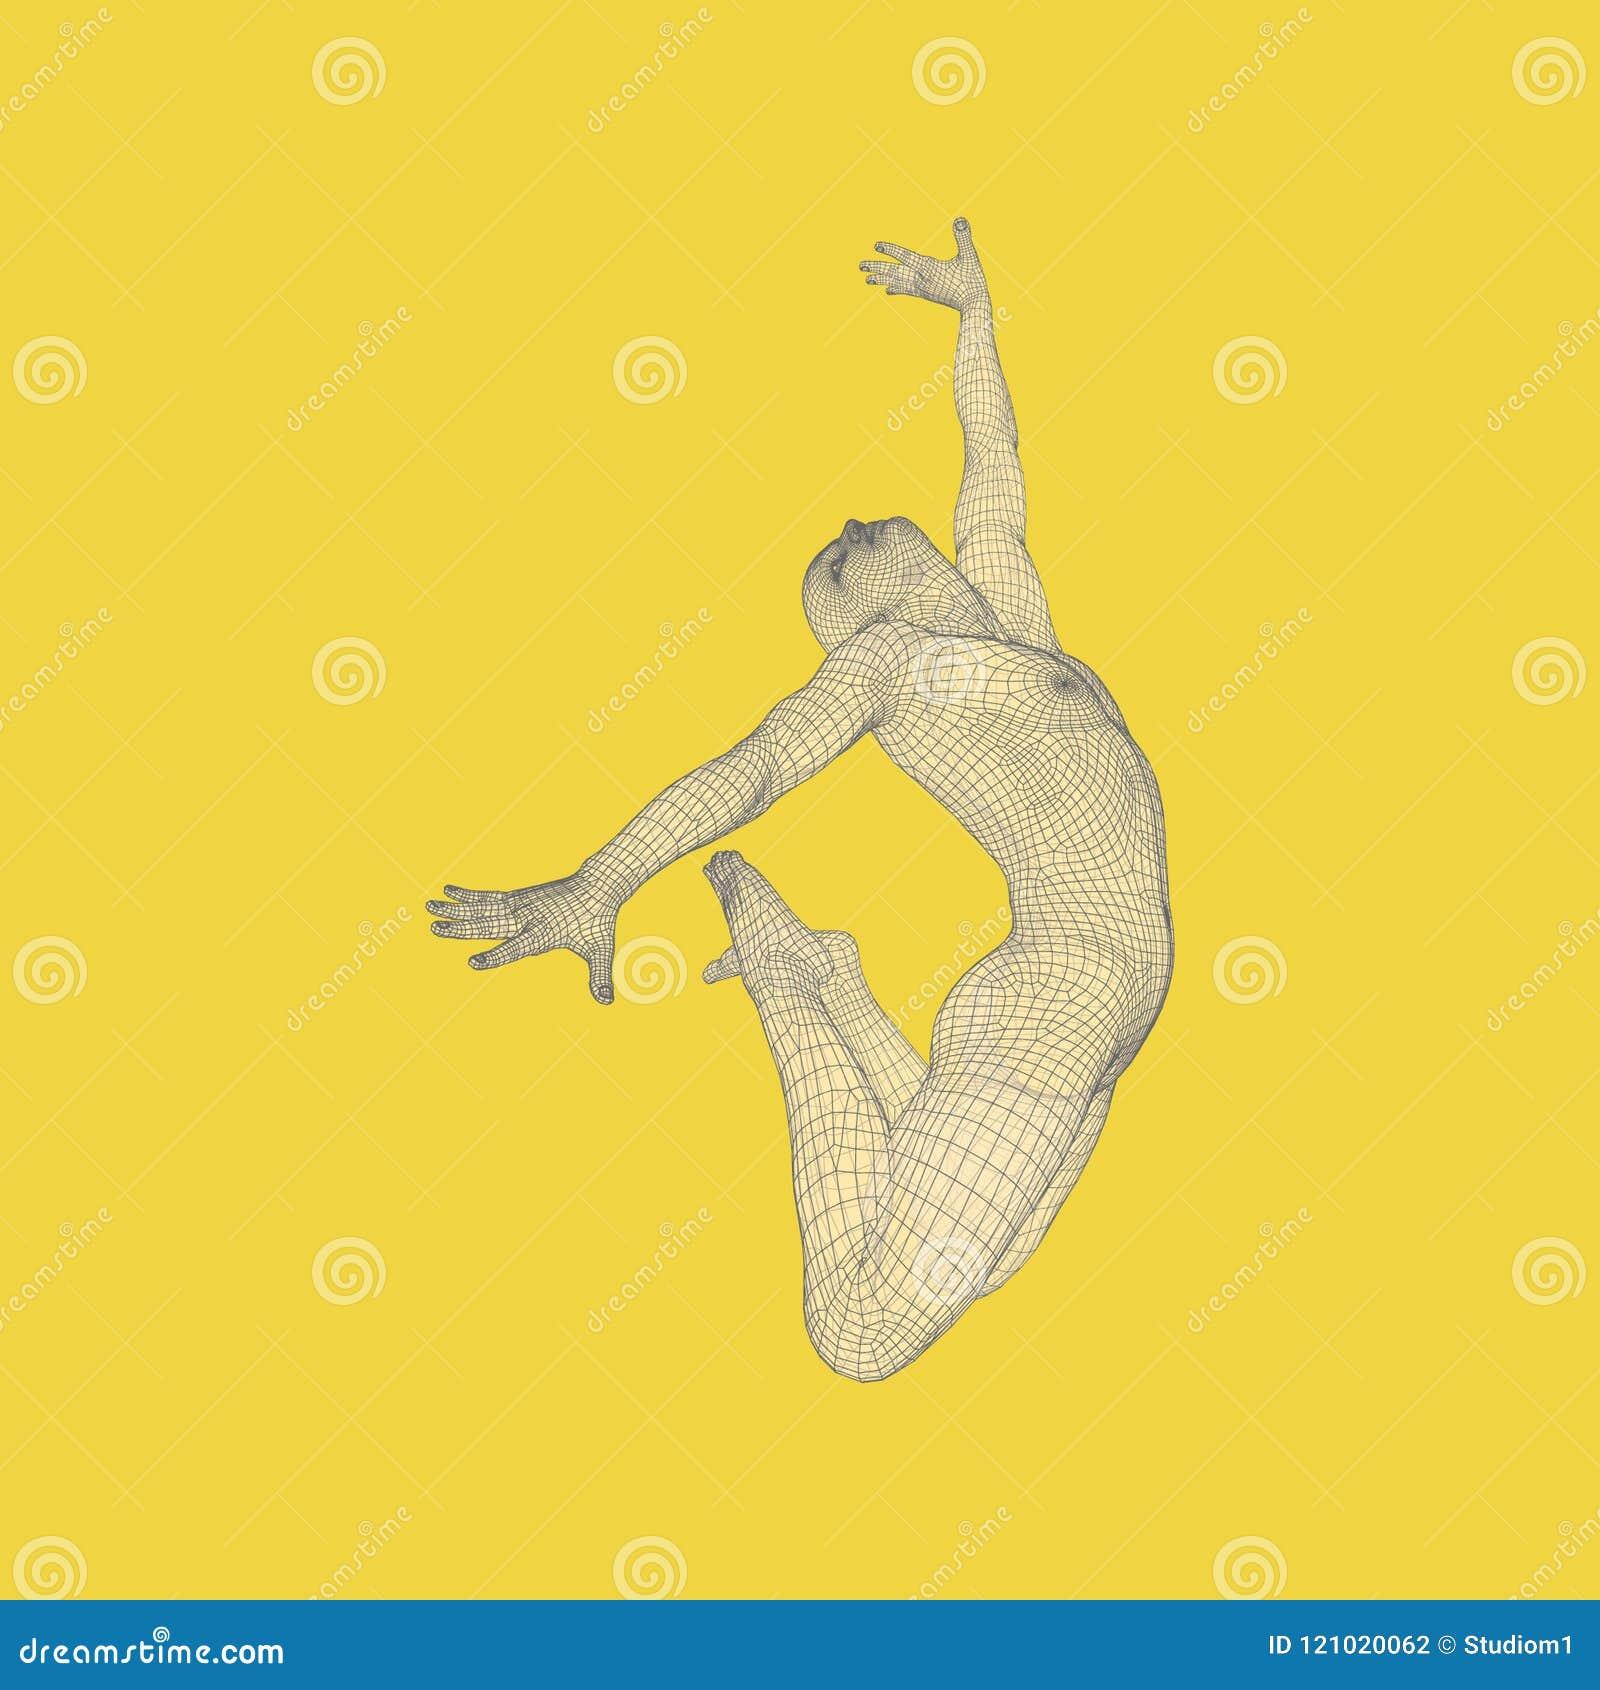 La ginnasta esegue un elemento artistico Ginnastica ritmica, acrobatica e aerobica